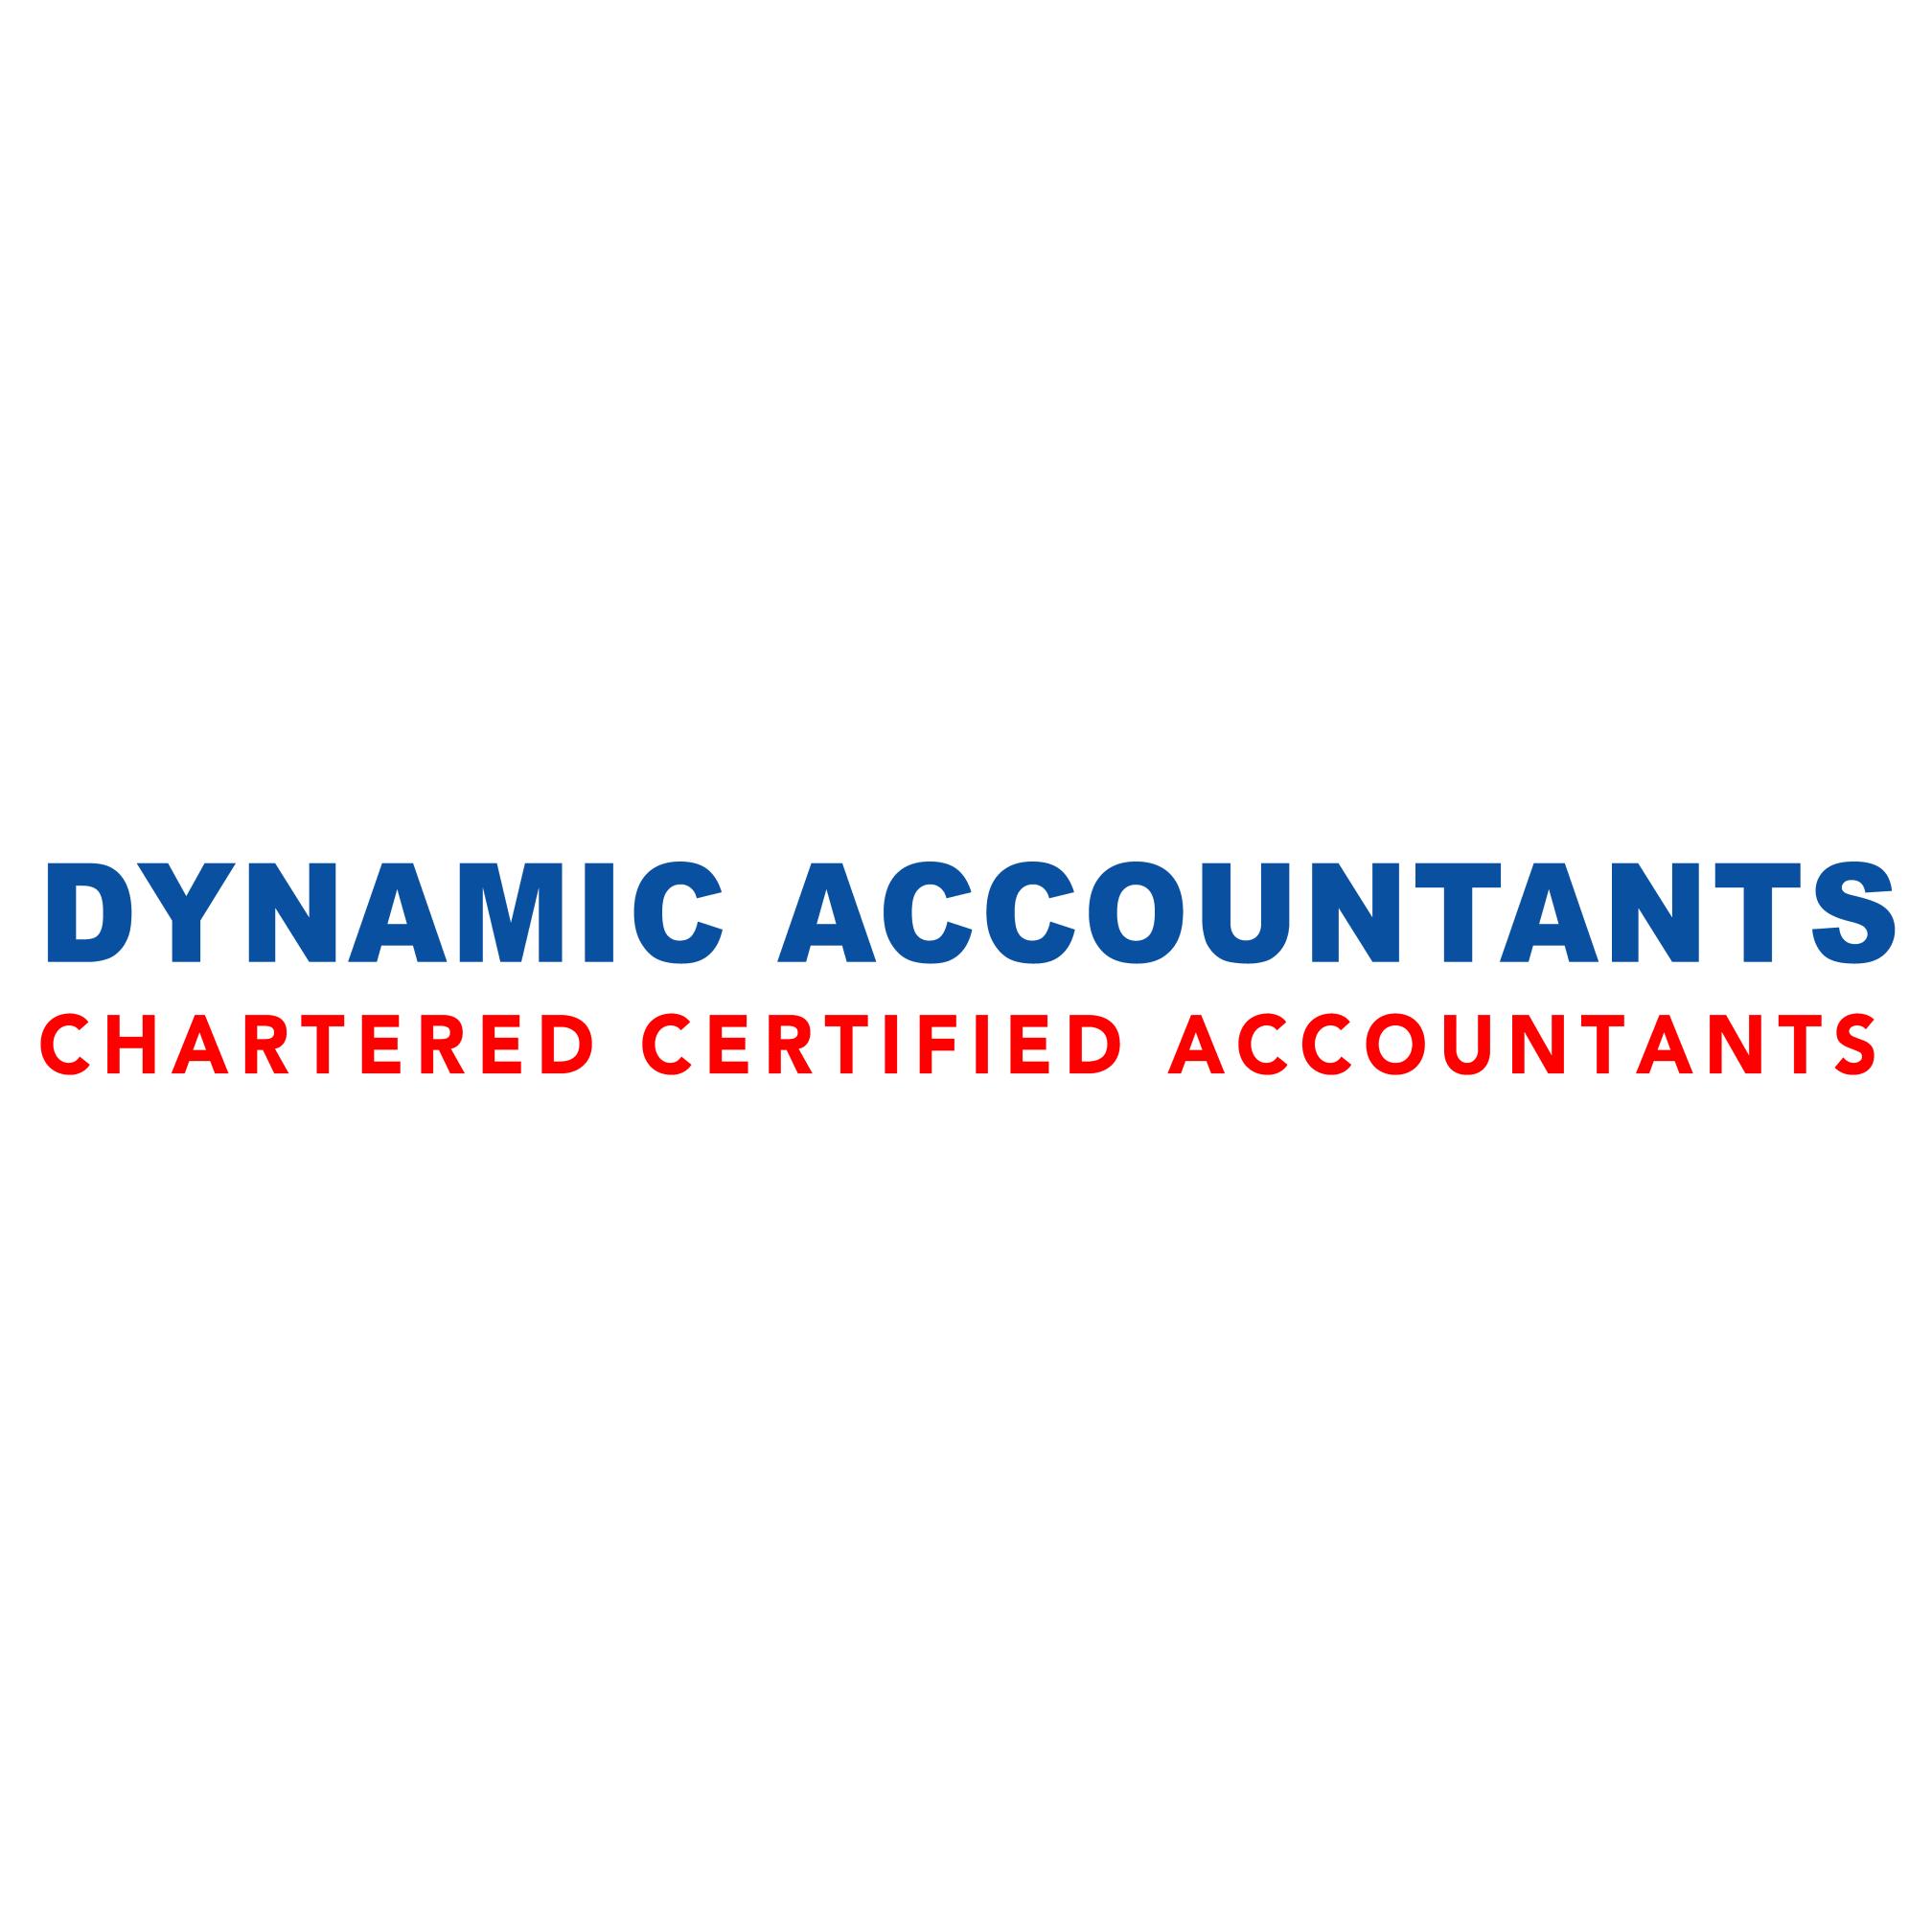 Dynamic Accountants